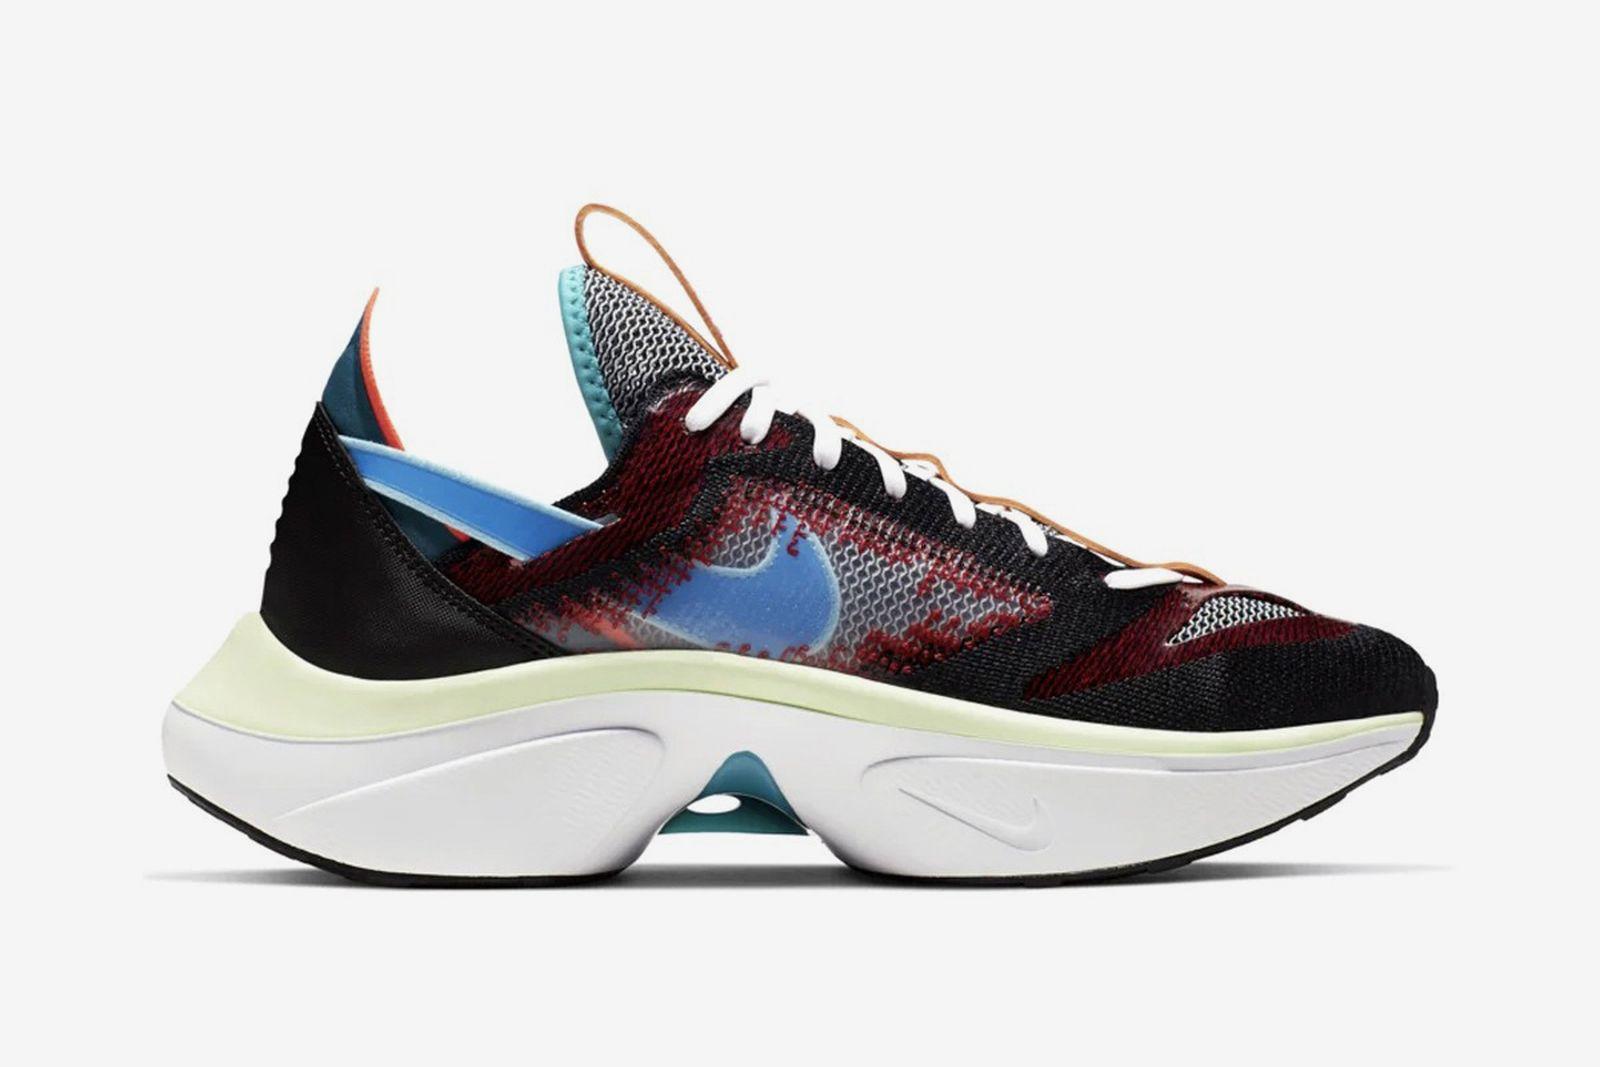 Indica Arriesgado Planta  Nike's New N110 D/MS/X DIMSIX Runner Drops Tomorrow